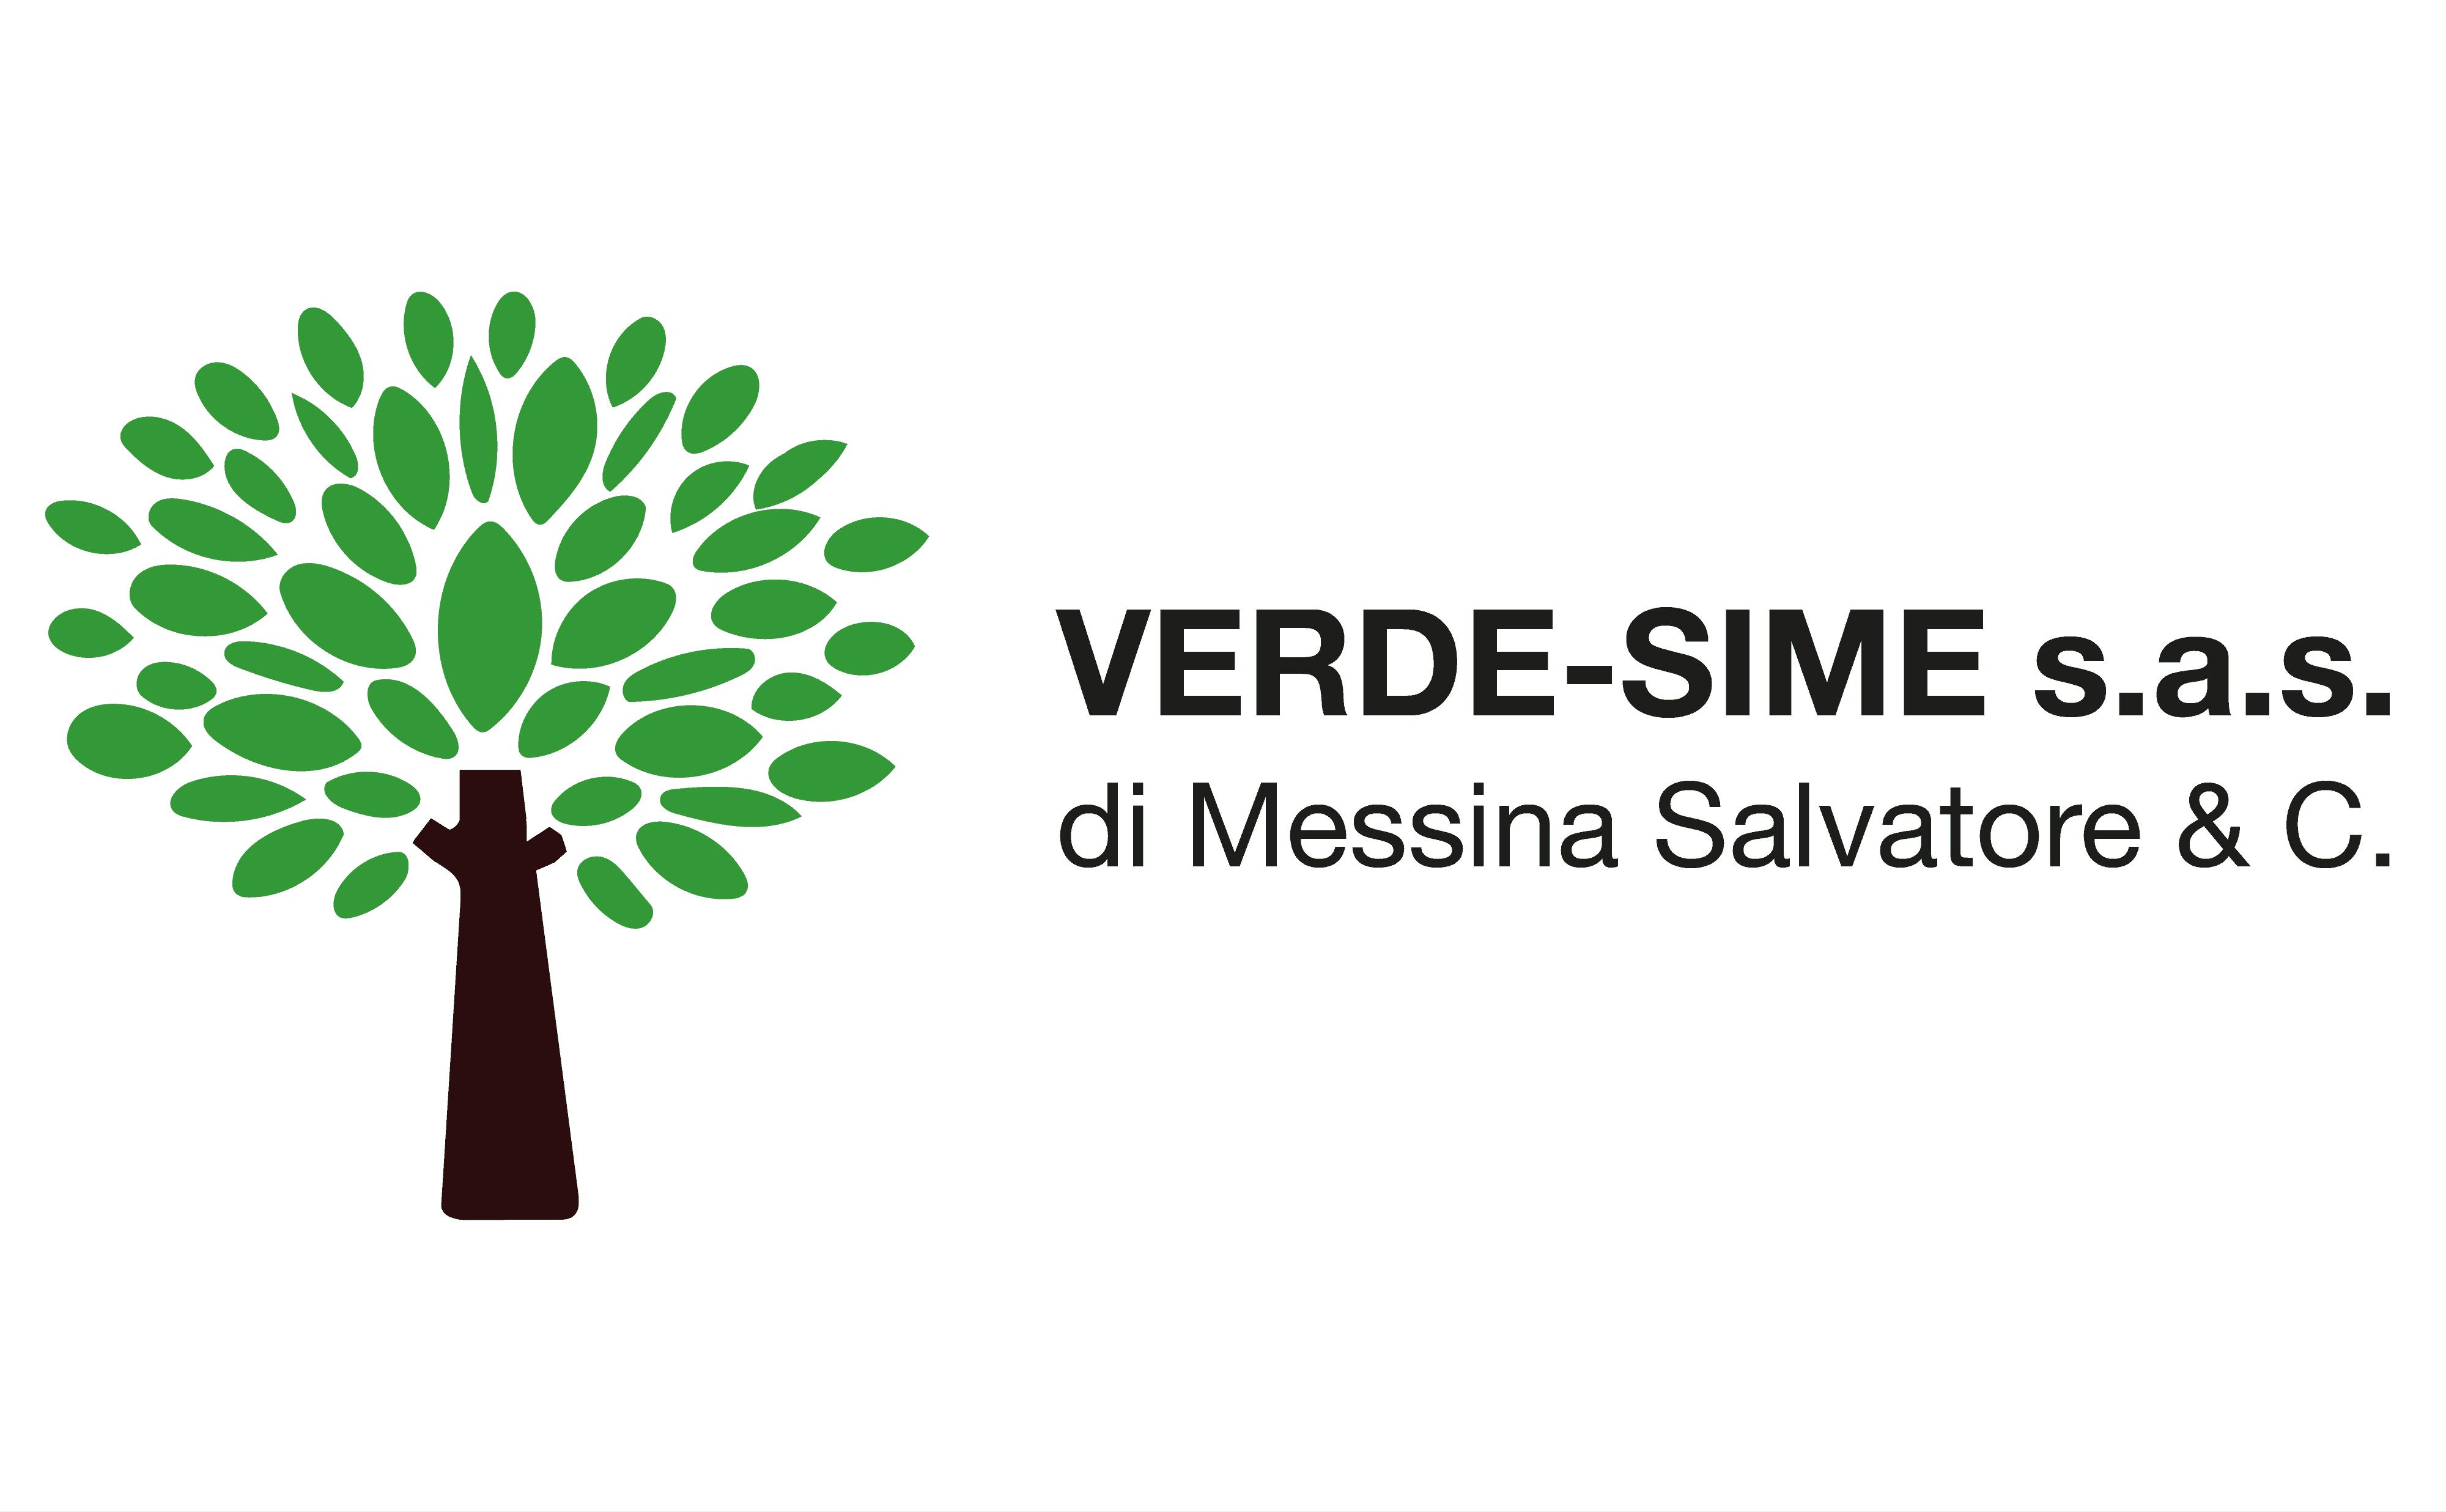 Verde-Sime